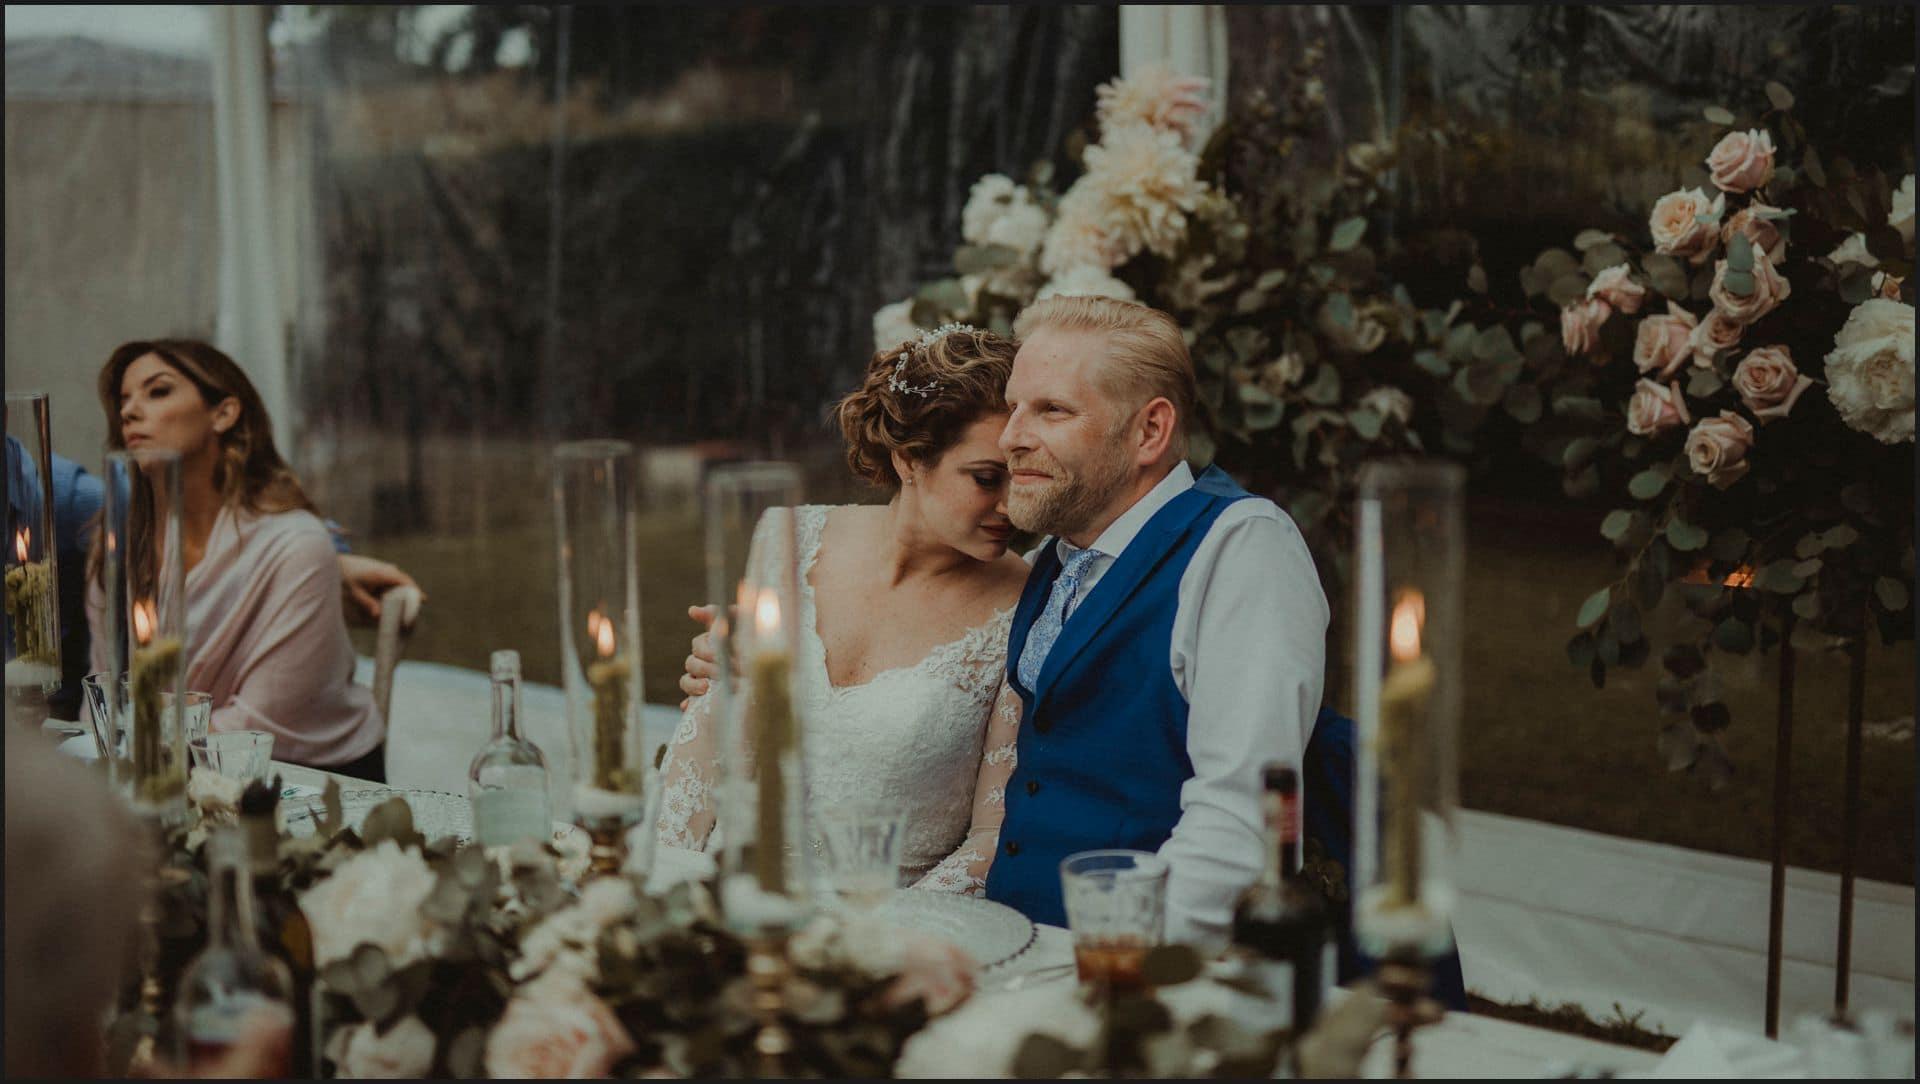 tuscany, destination wedding, chianti, bride, groom, intimate